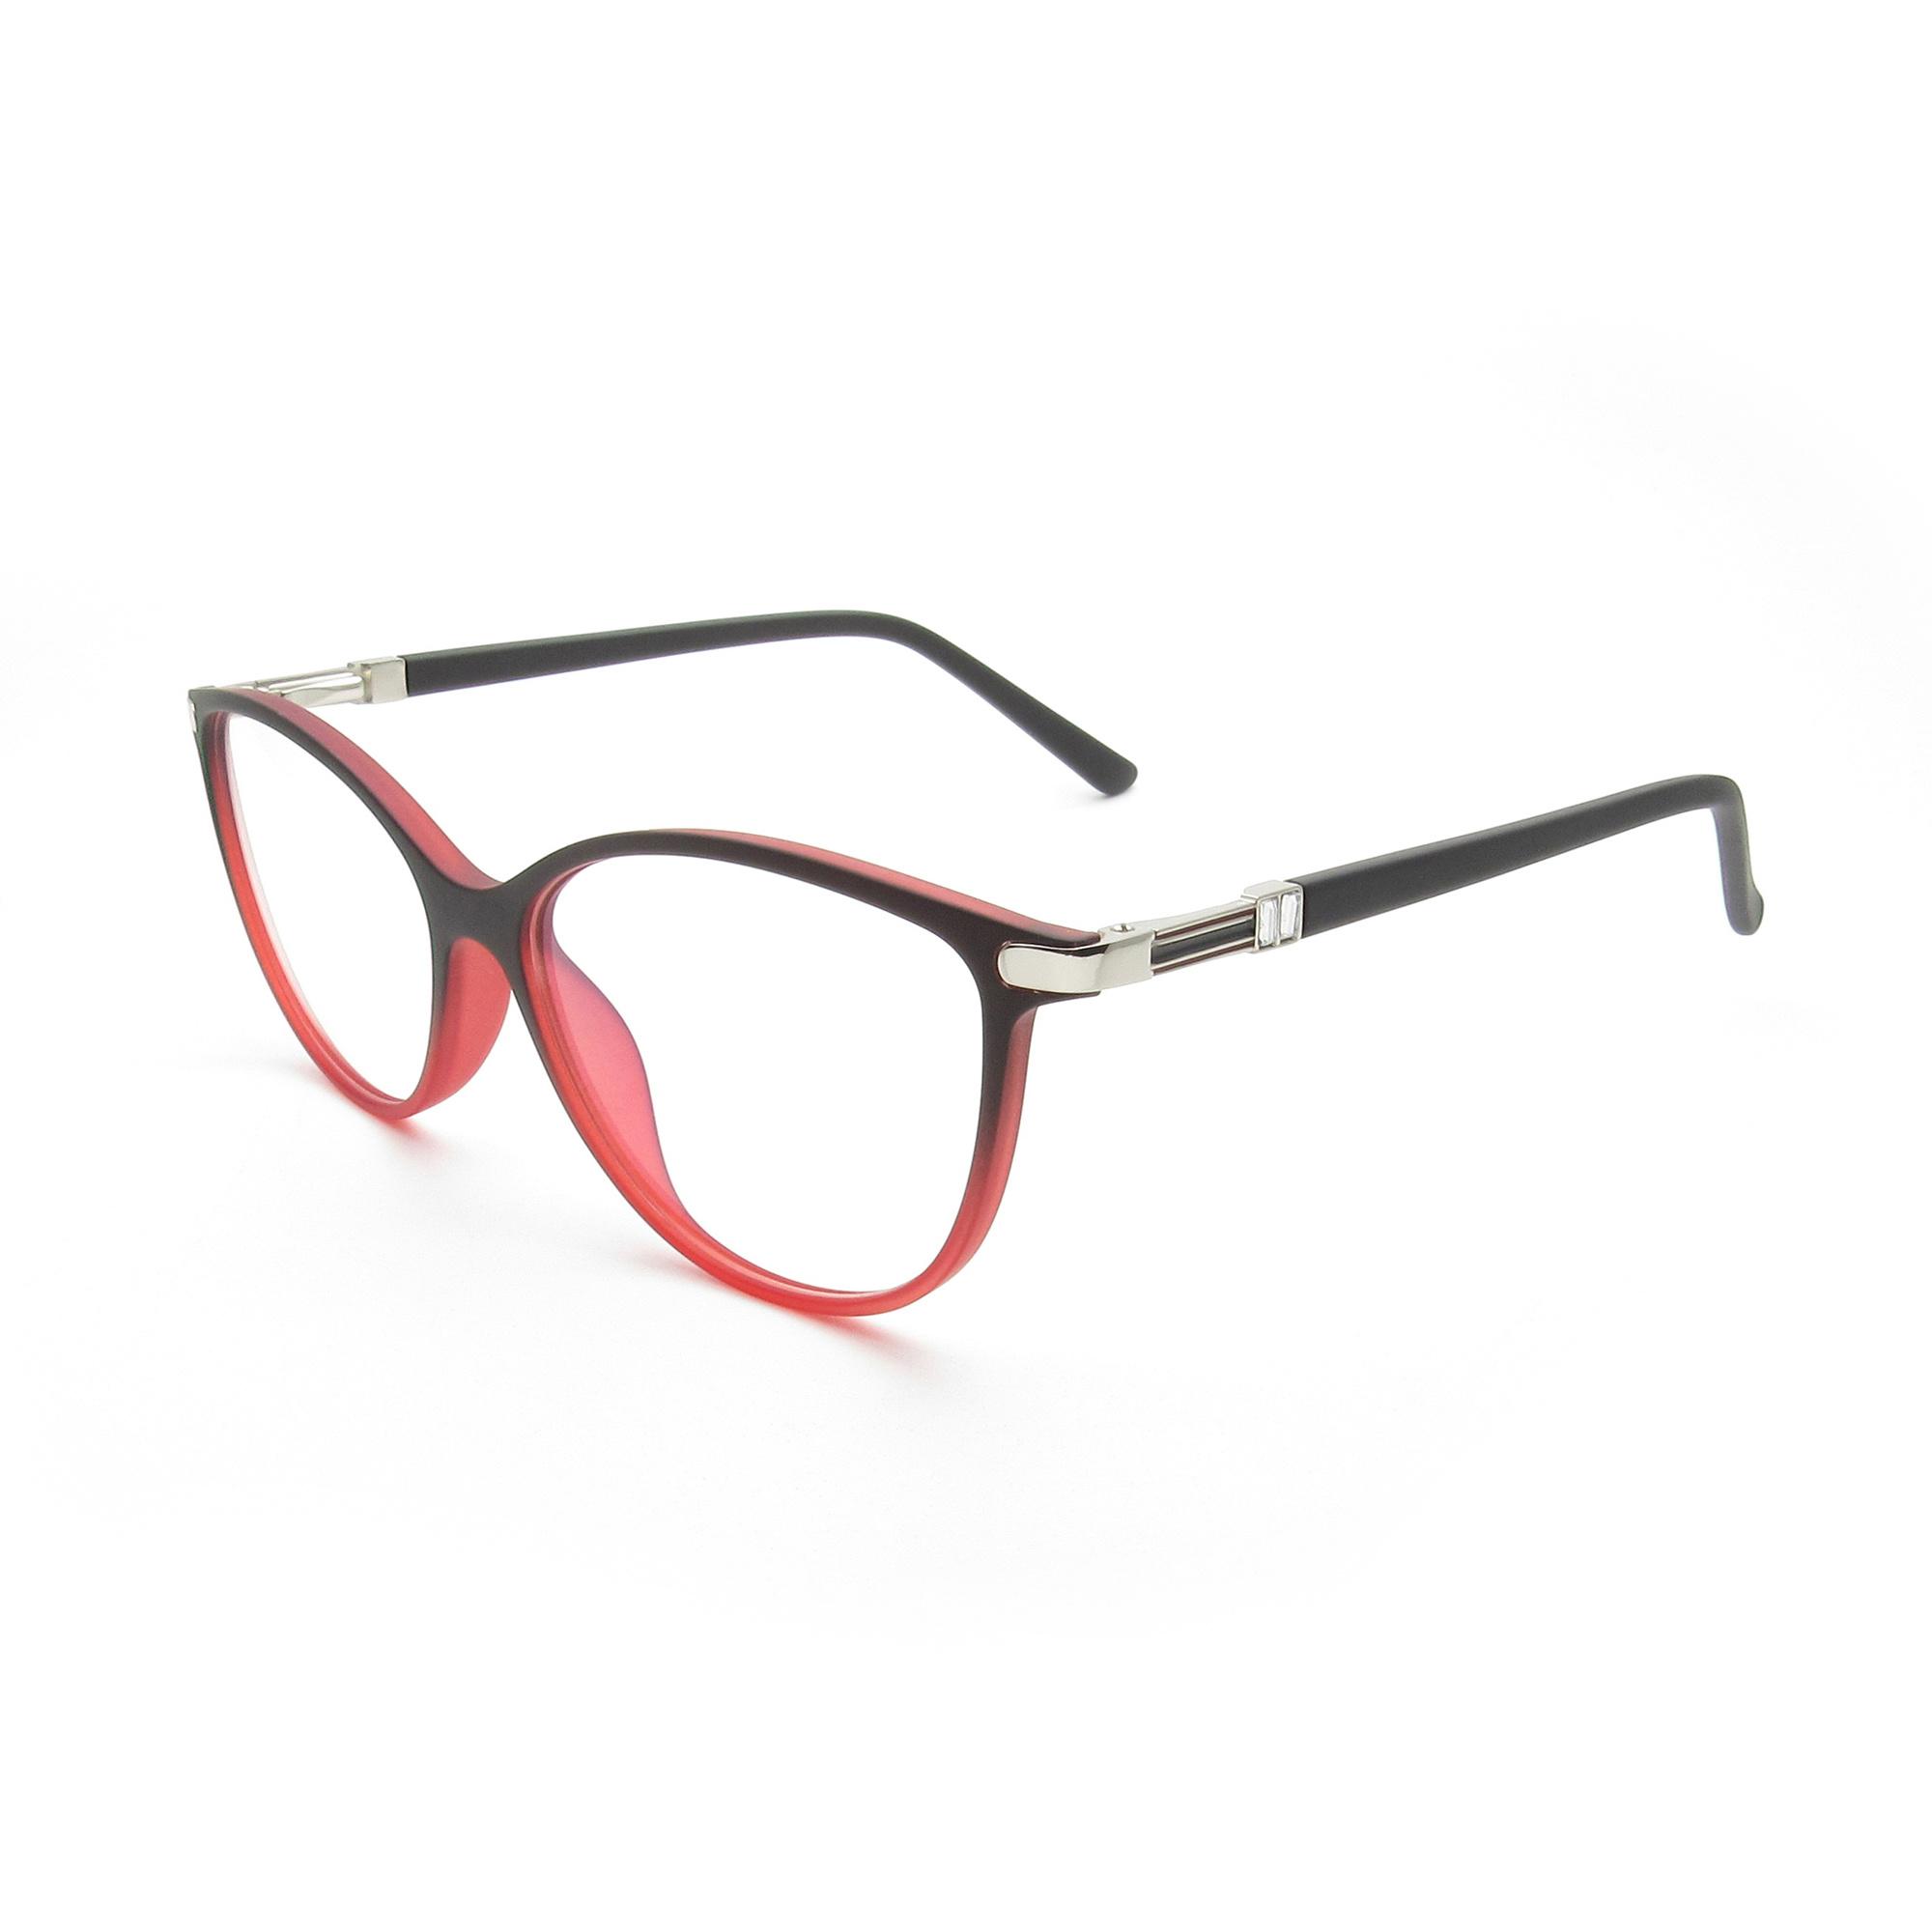 China High Quality Tr8354-8 Big Tr90 Multi Color Optical Frame for ...